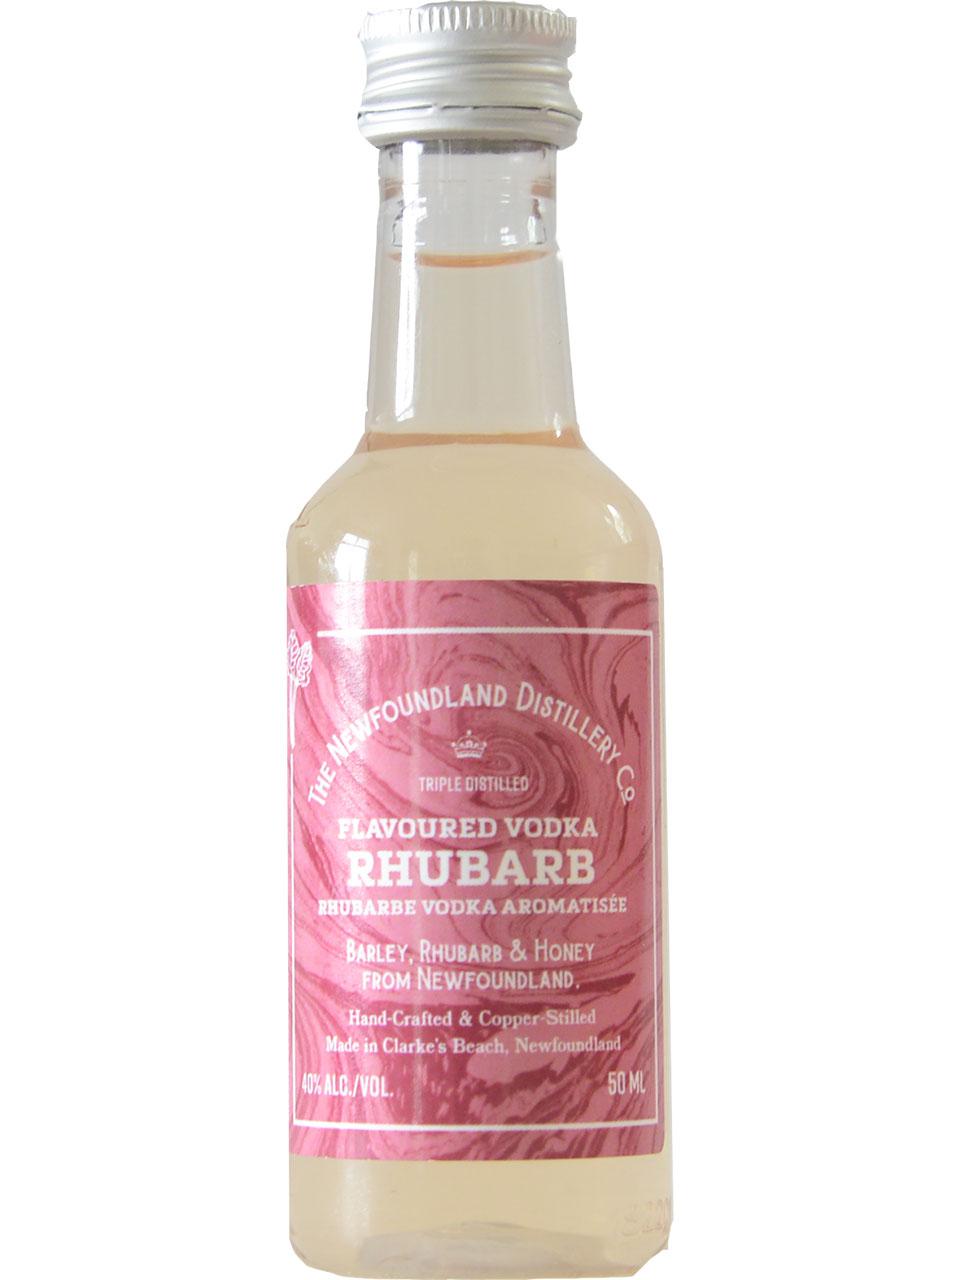 The Newfoundland Distillery Co. Rhubarb Vodka